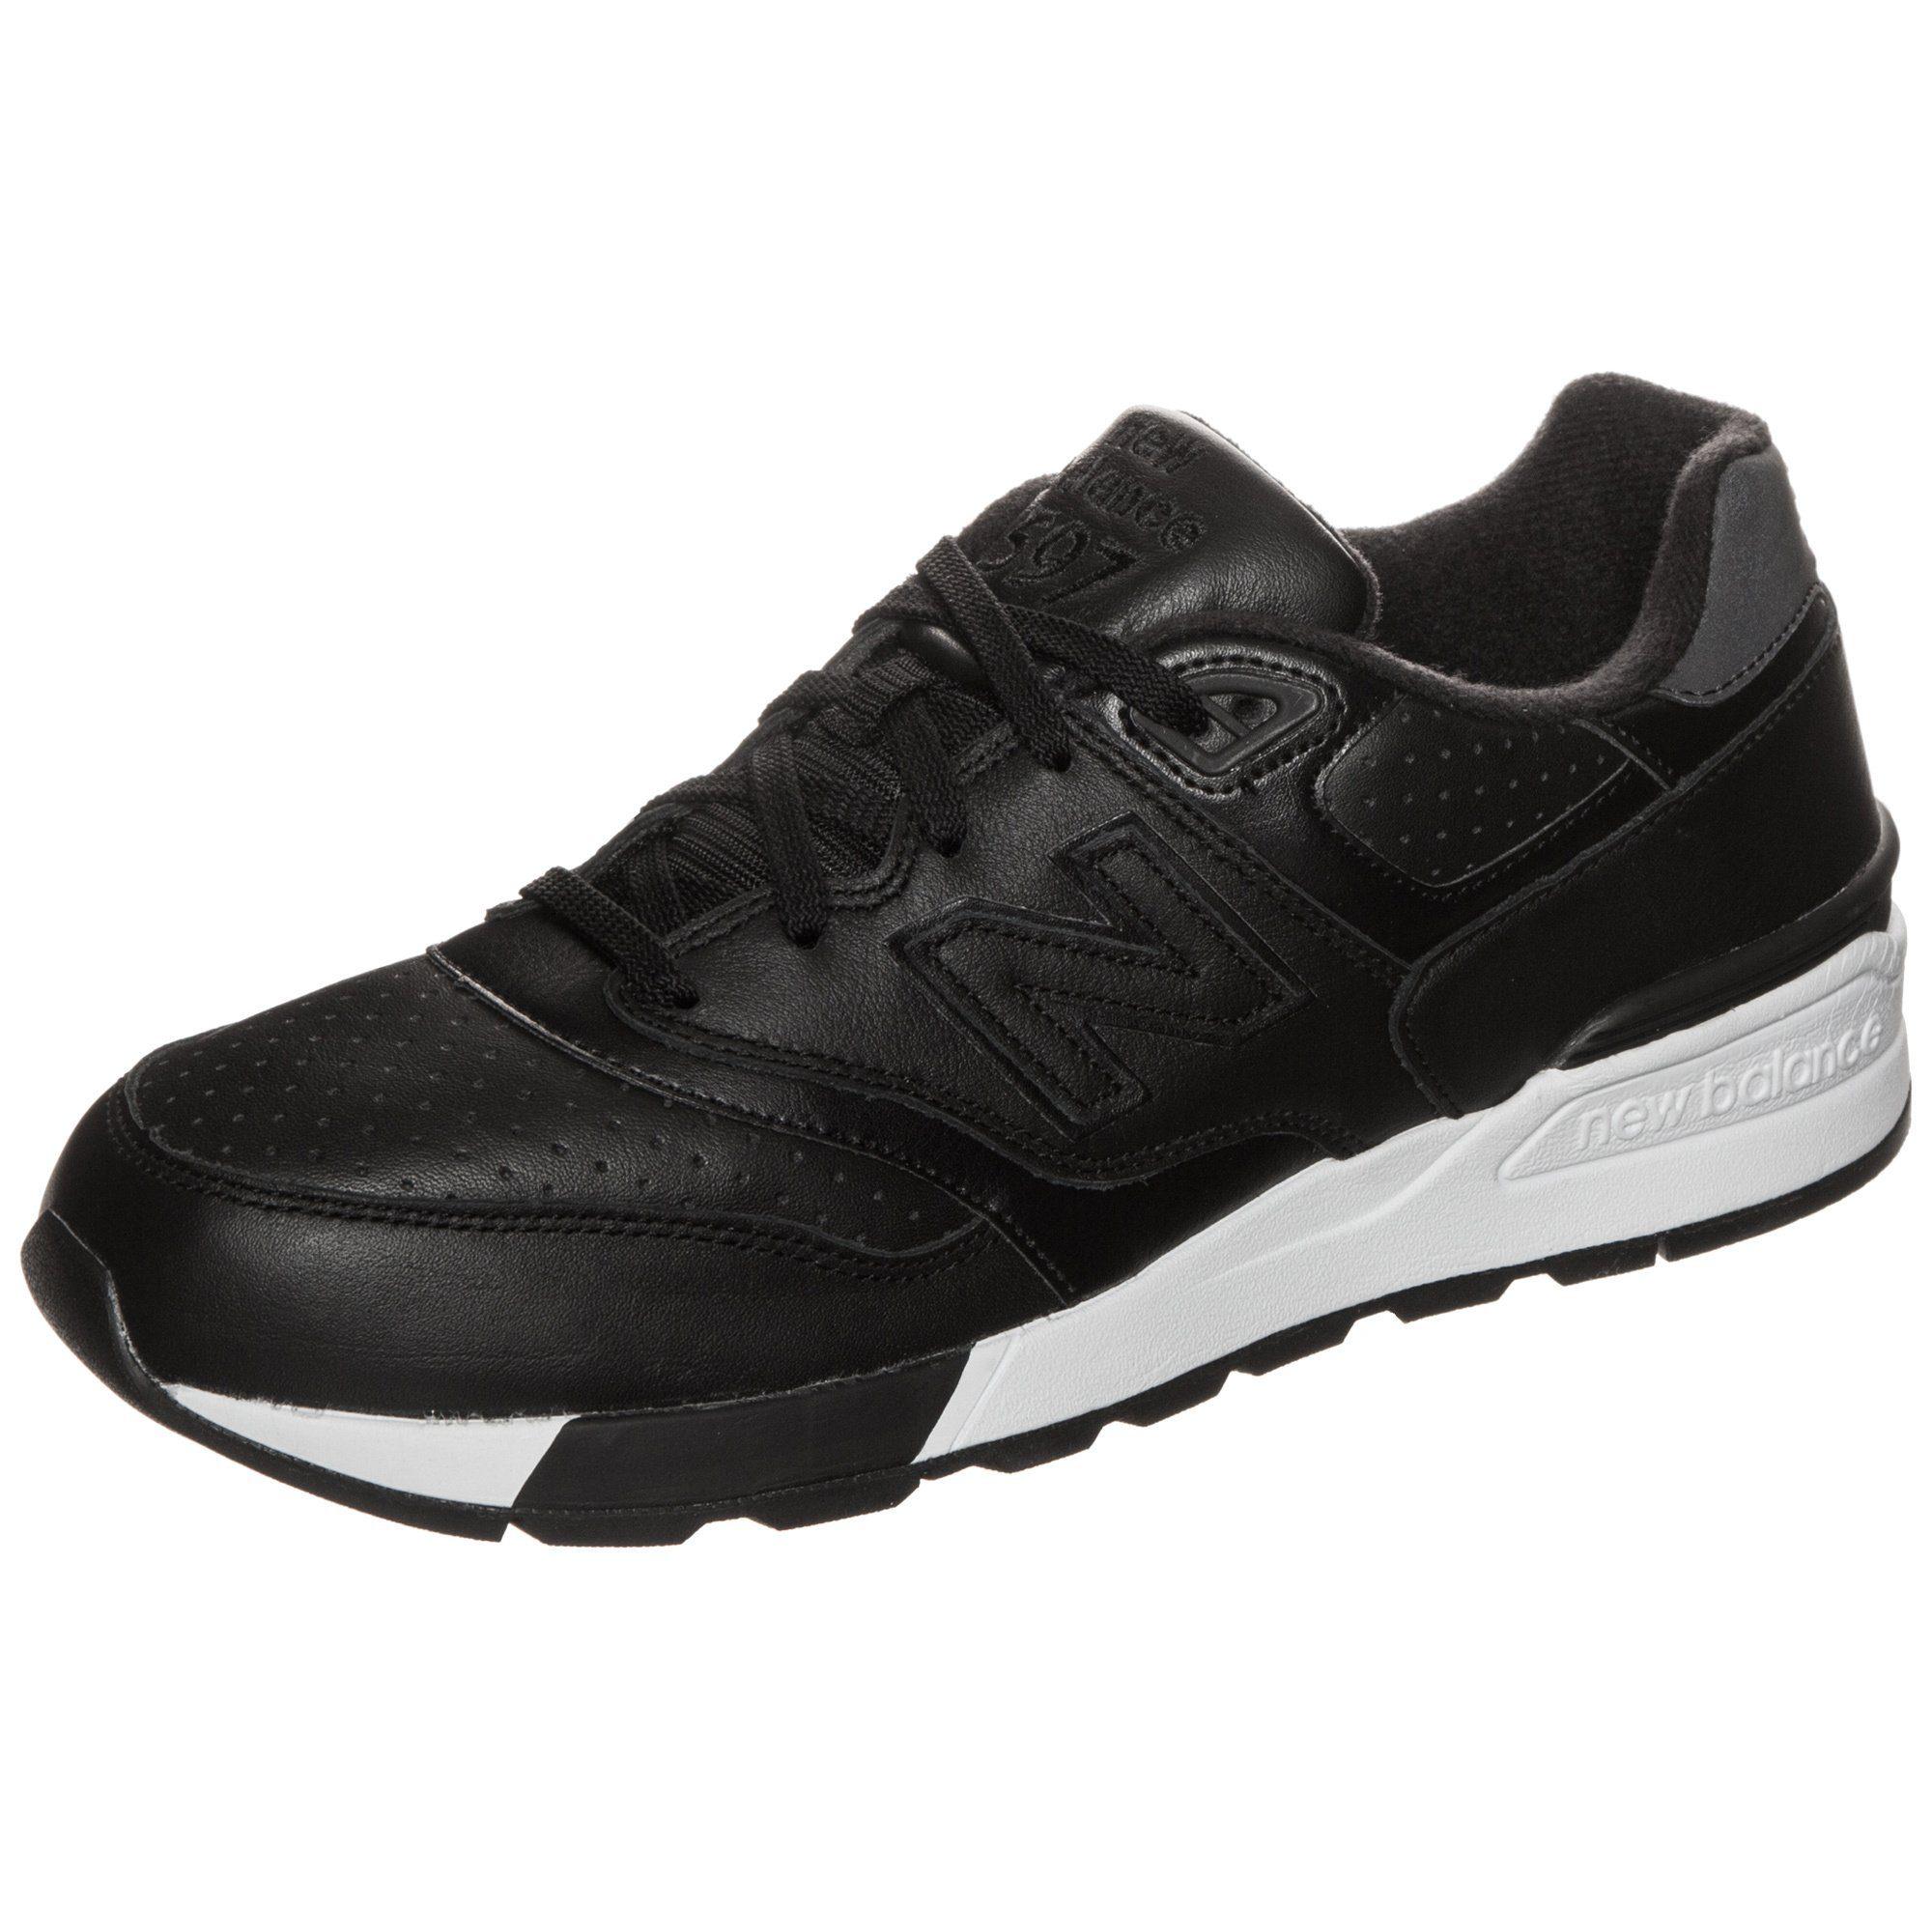 new balance sneaker ml597 bll d per rechnung baur. Black Bedroom Furniture Sets. Home Design Ideas